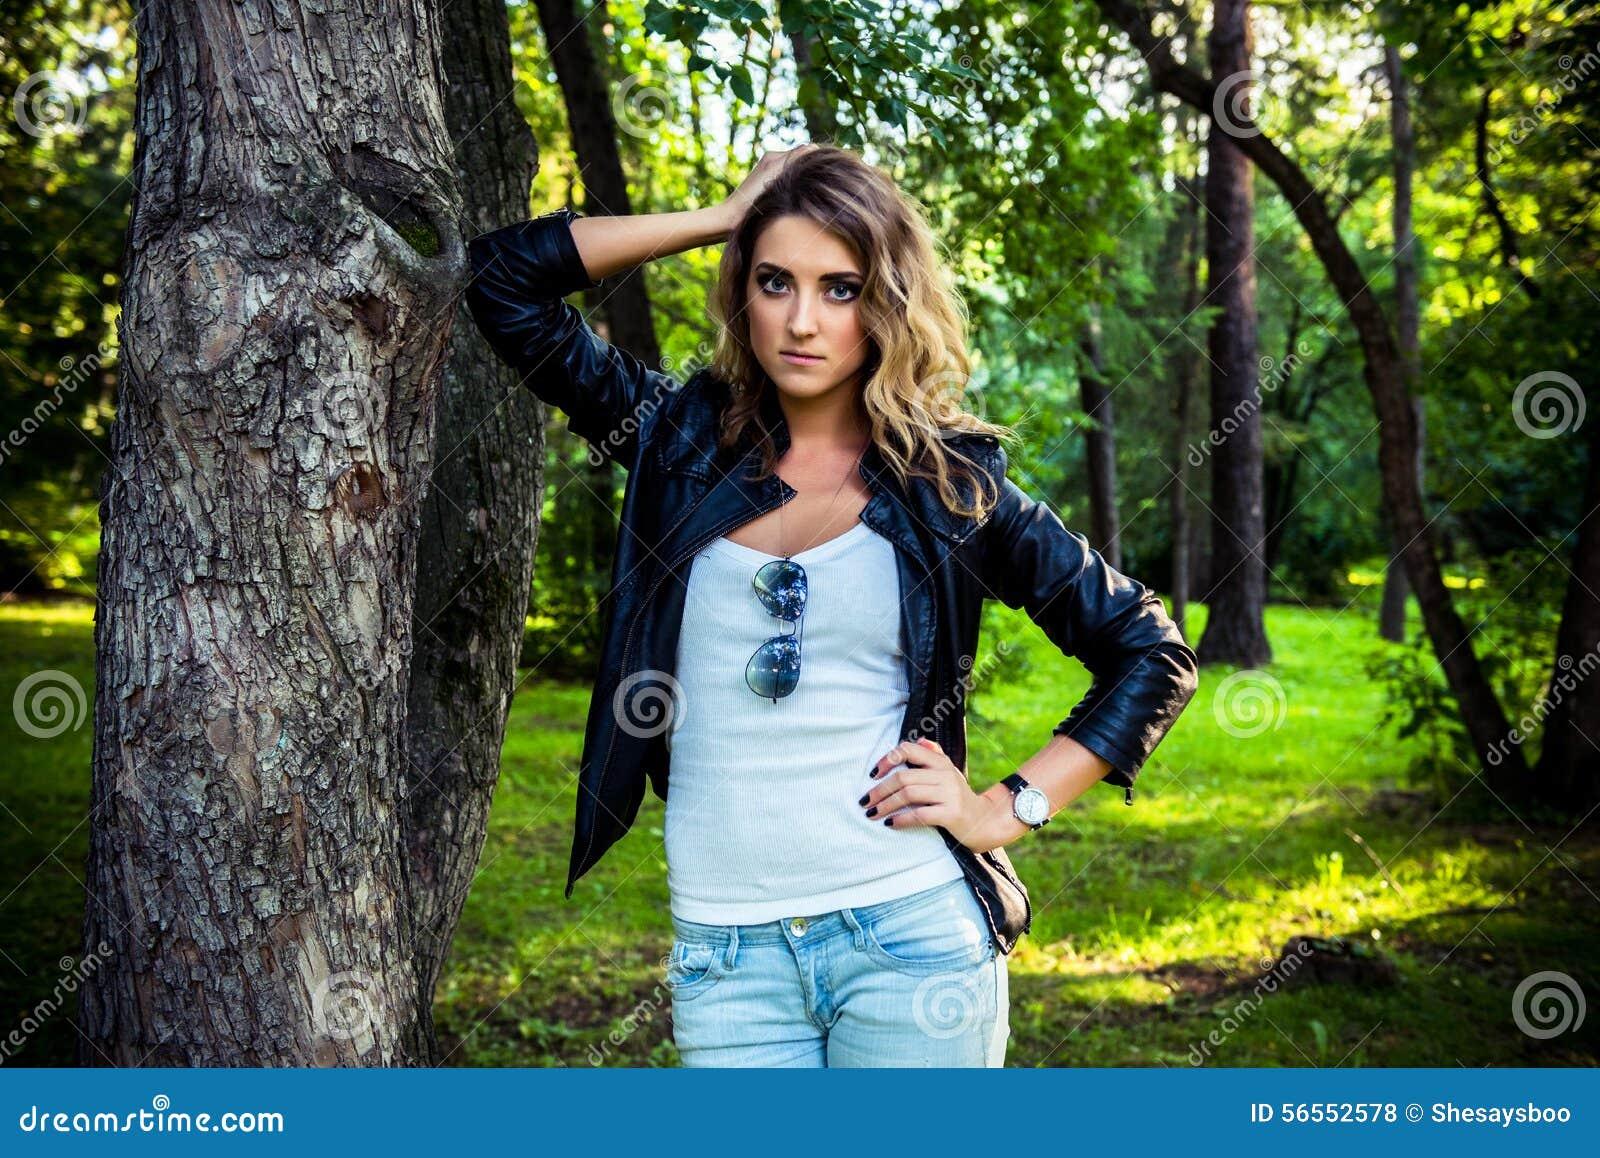 Download Τοποθέτηση κοριτσιών μόδας με το σακάκι δέρματος Στοκ Εικόνες - εικόνα από πορτρέτο, χαμόγελο: 56552578